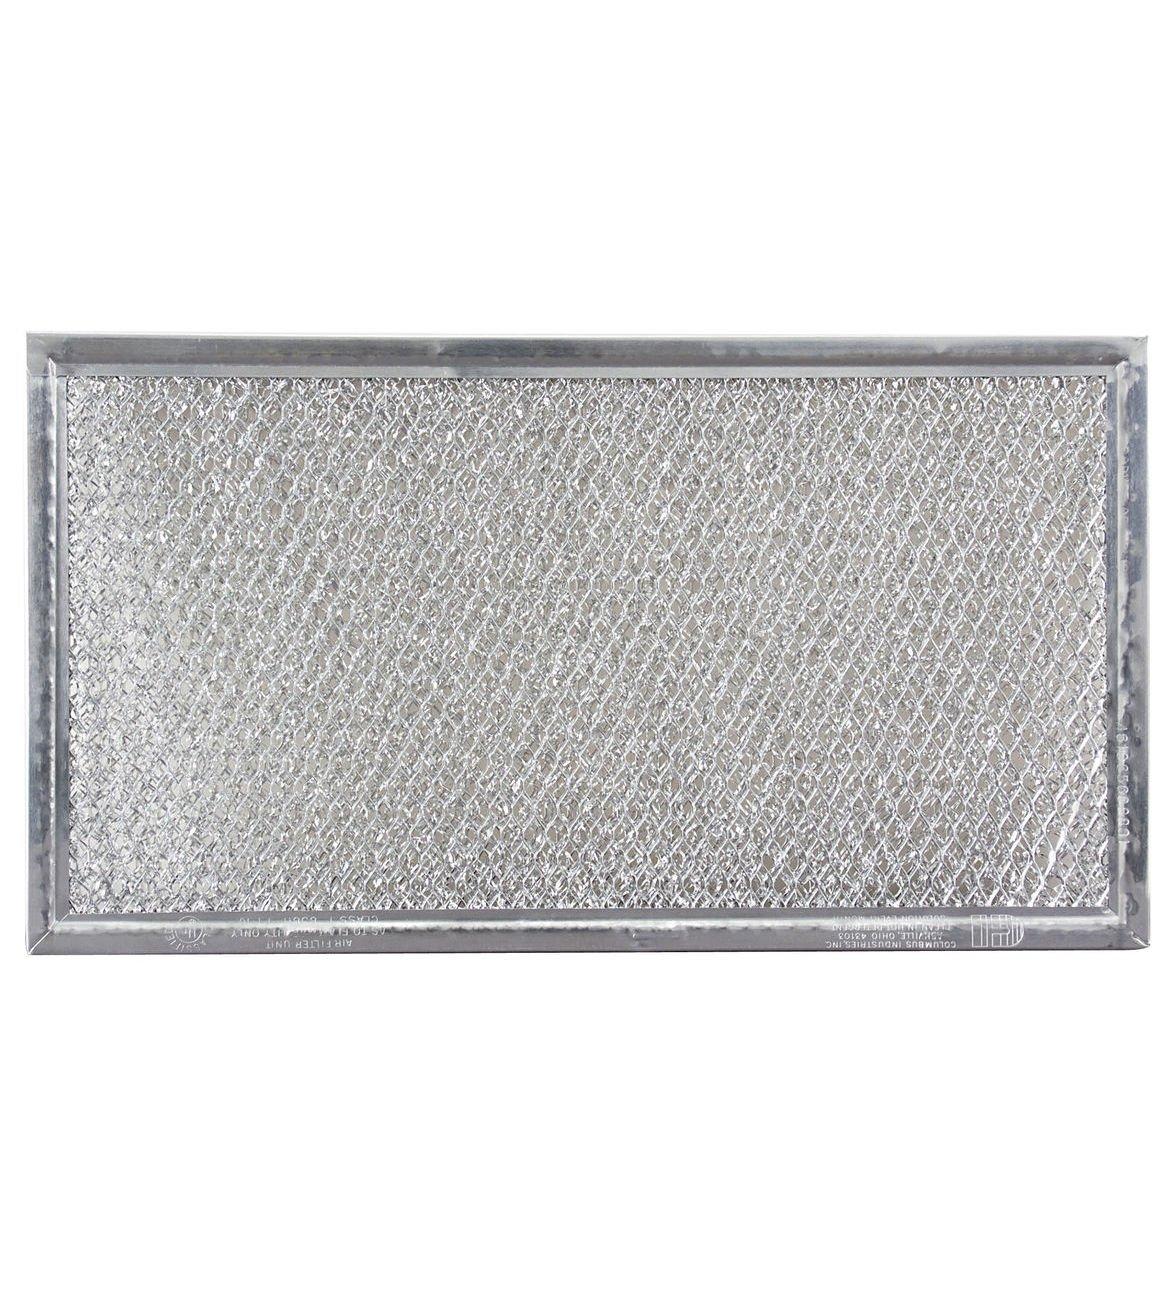 Whirlpool W10535950 Microwave Grease Filter, Genuine OEM Product